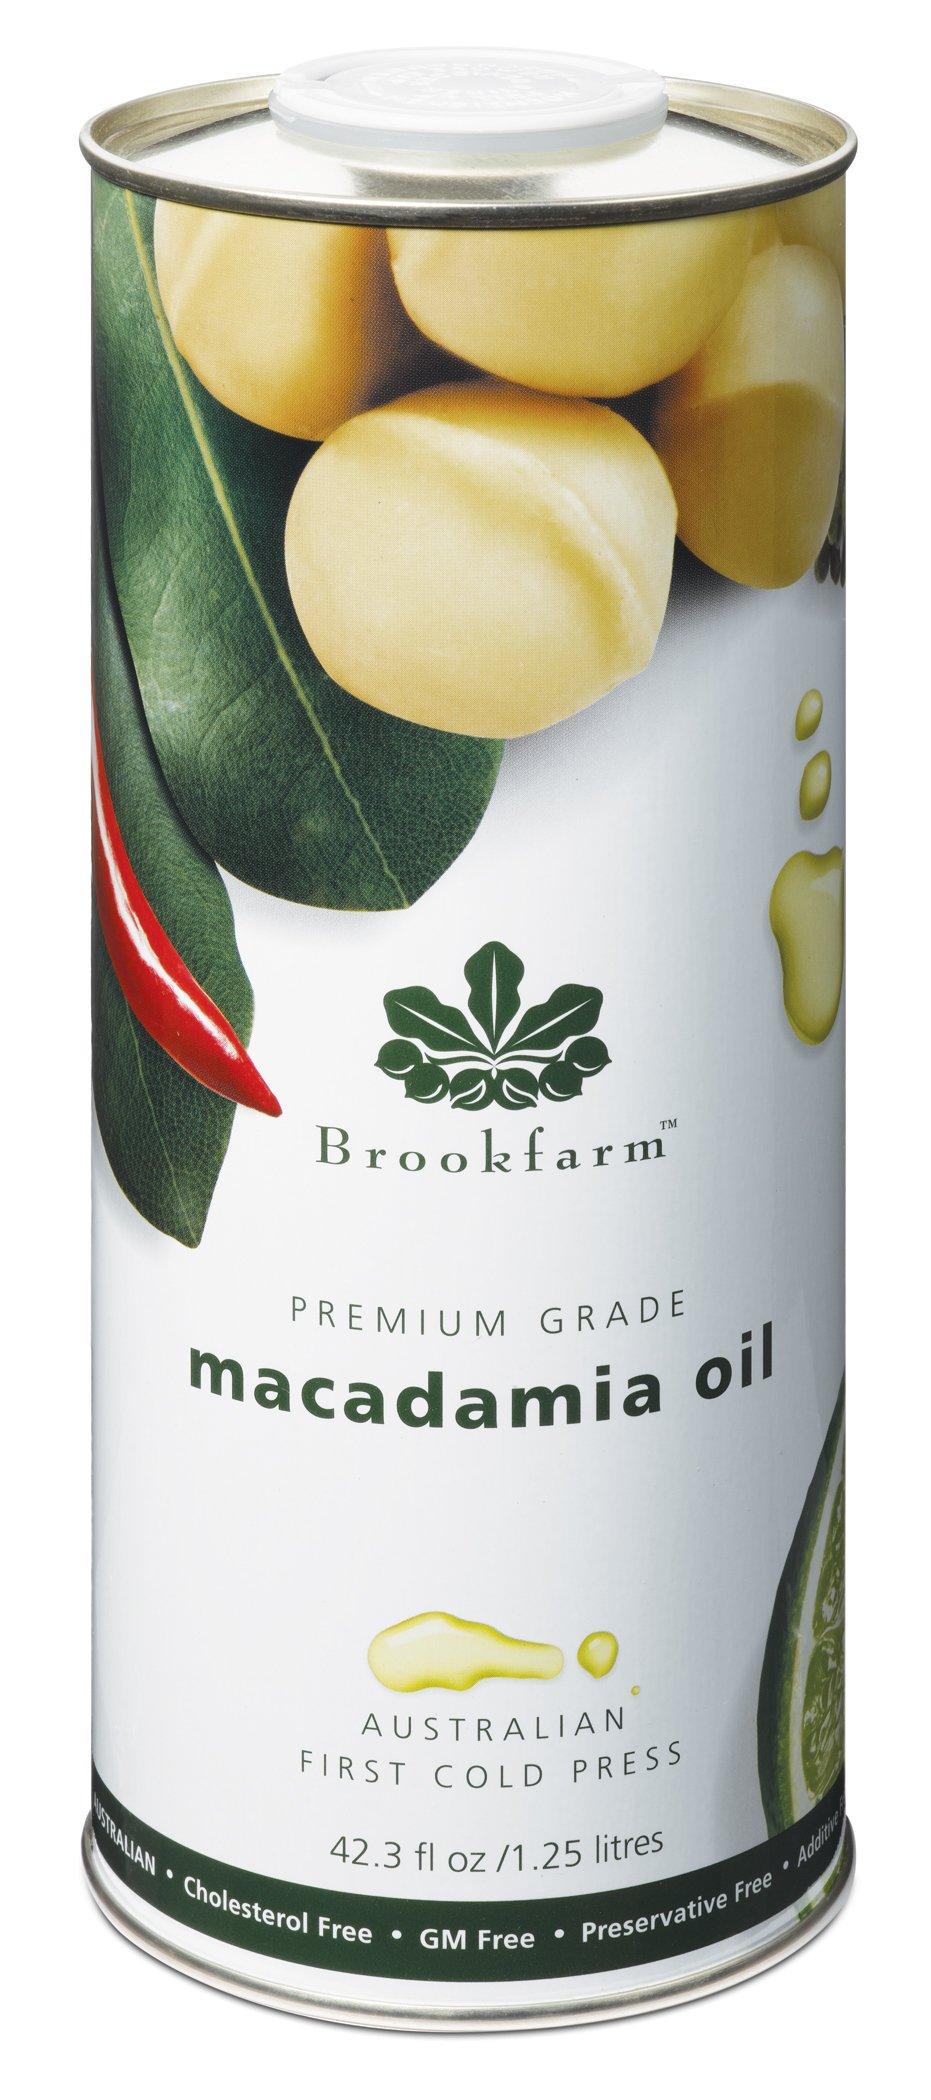 Brookfarm Premium-Grade Natural Macadamia Oil, 42.3 fl oz (1.25l) by Brookfarm